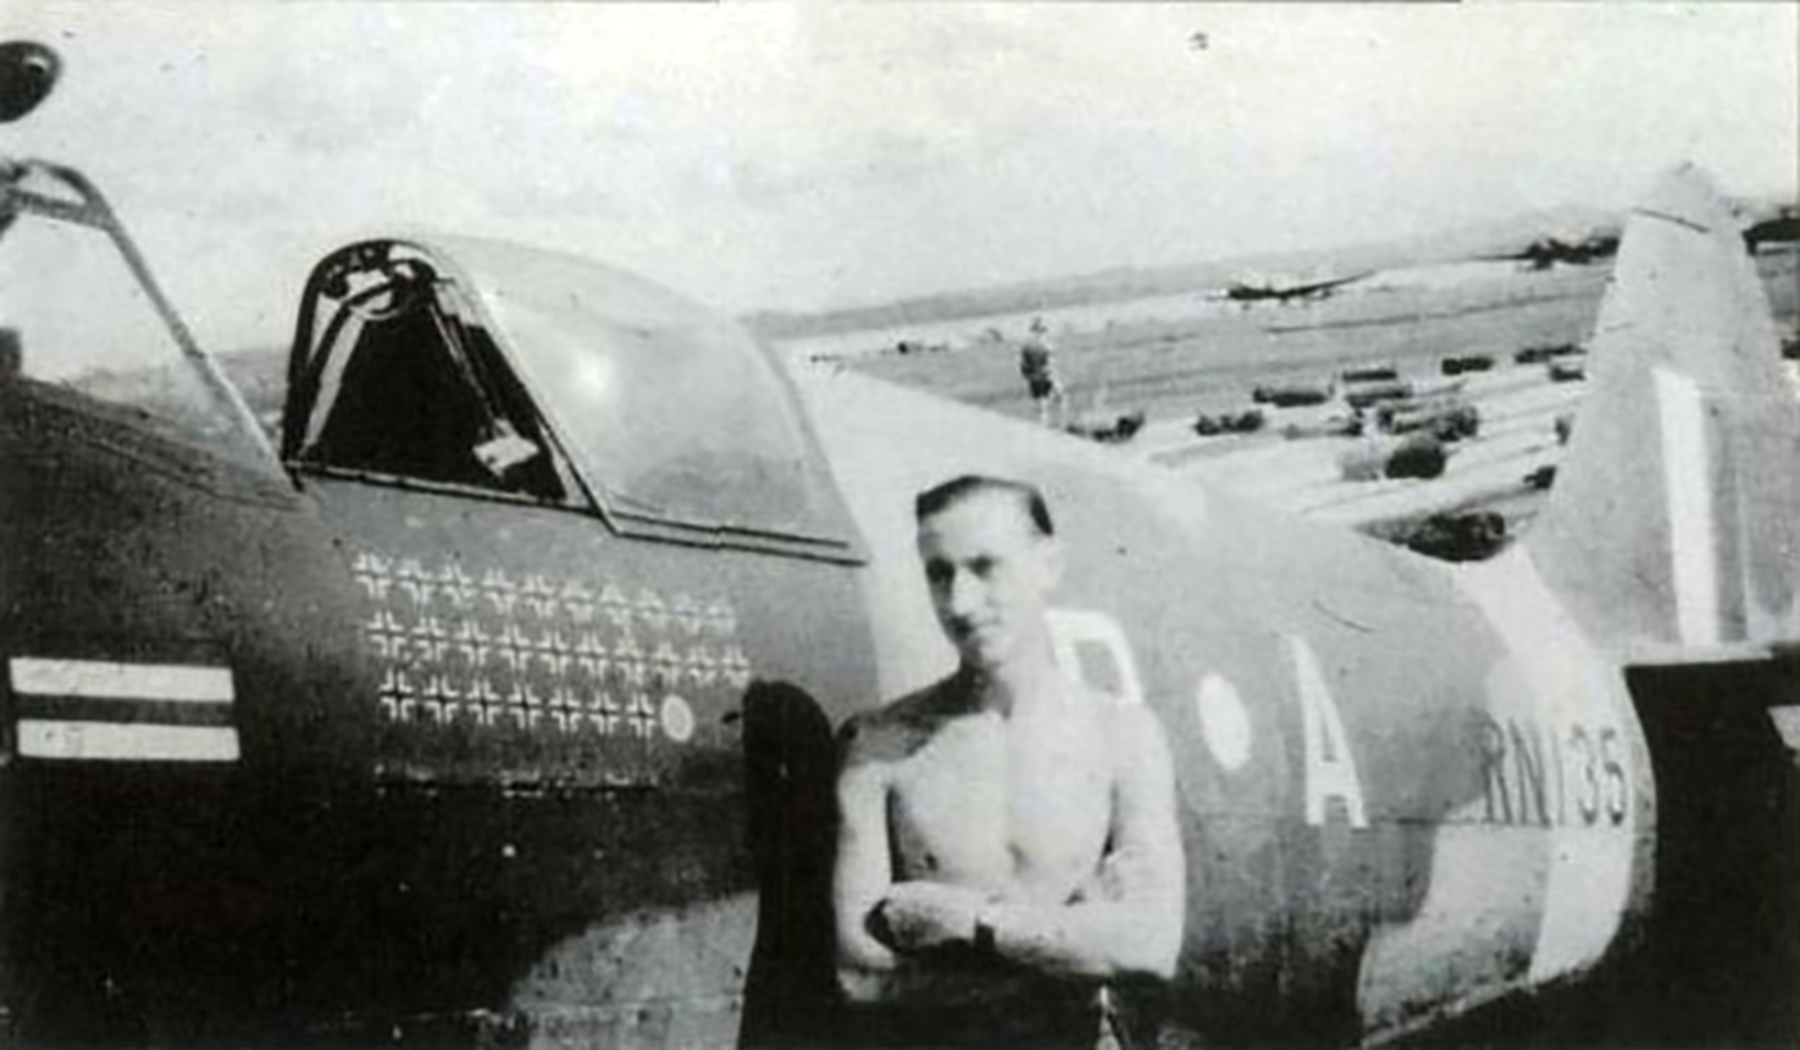 Spitfire XIVe 17Sqn YBA Lacey RN135 SEAC 1945 01